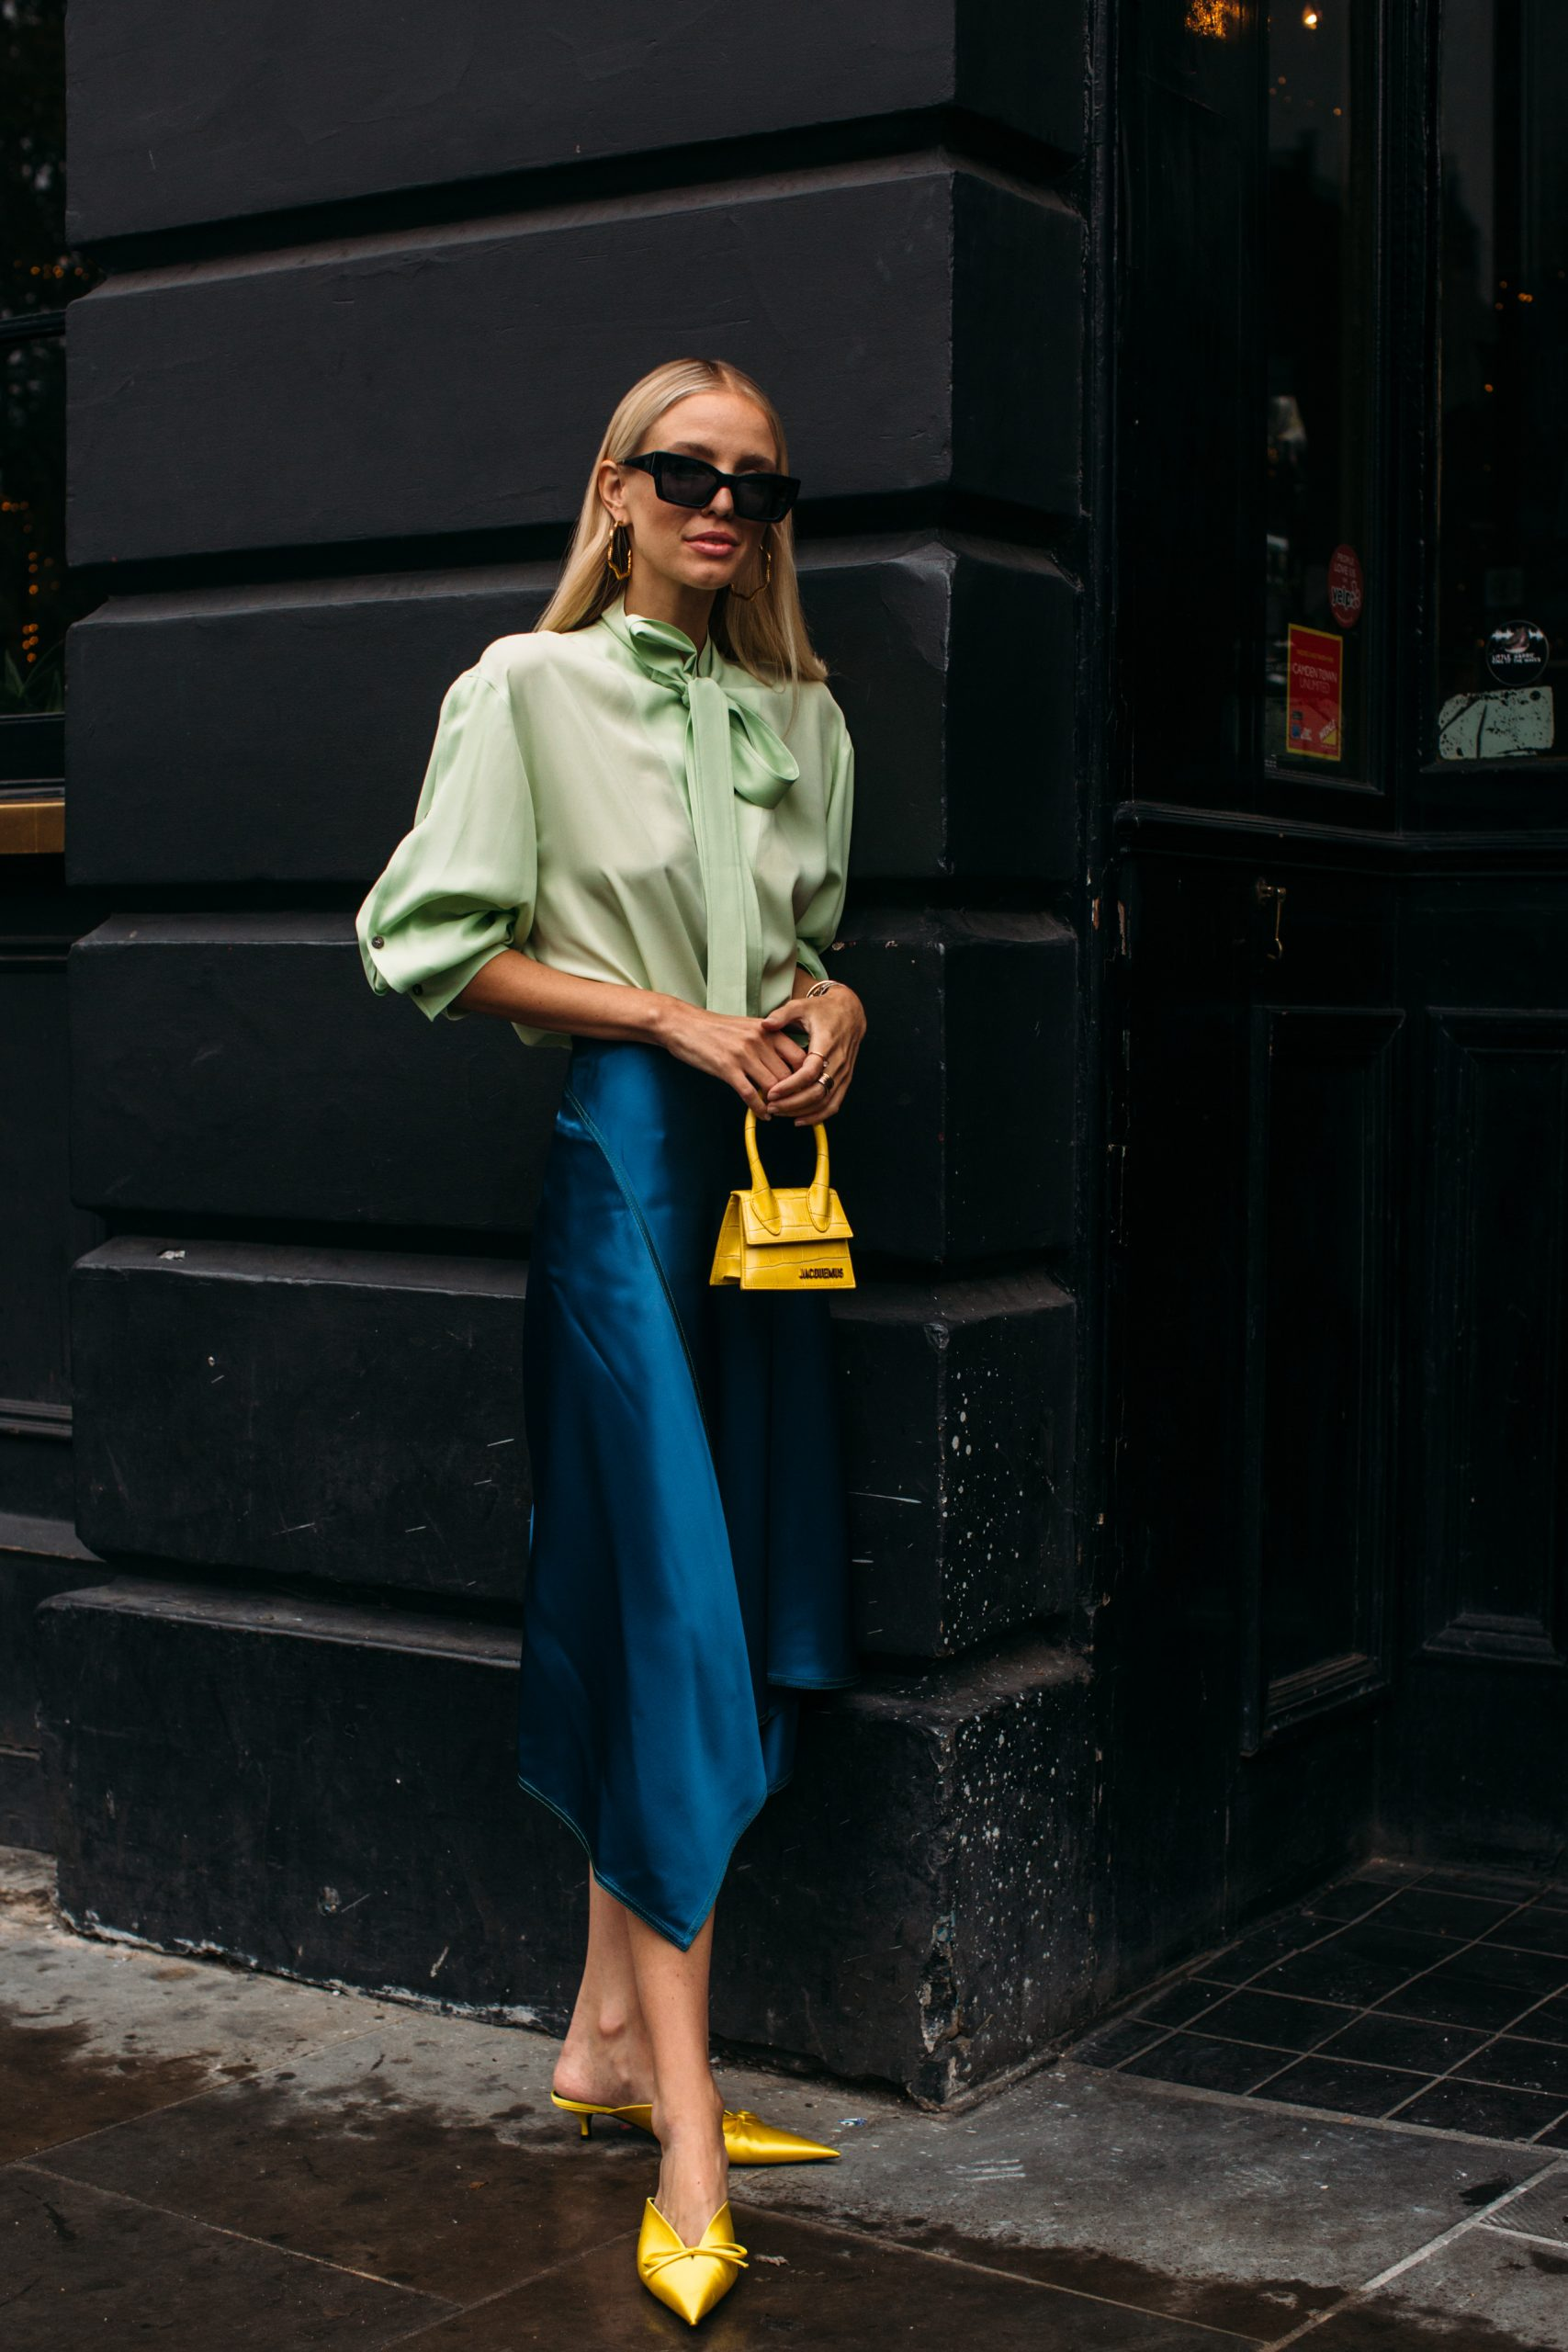 La influencer Leonie Hanne con blusa romántica/Foto: Imaxtree.